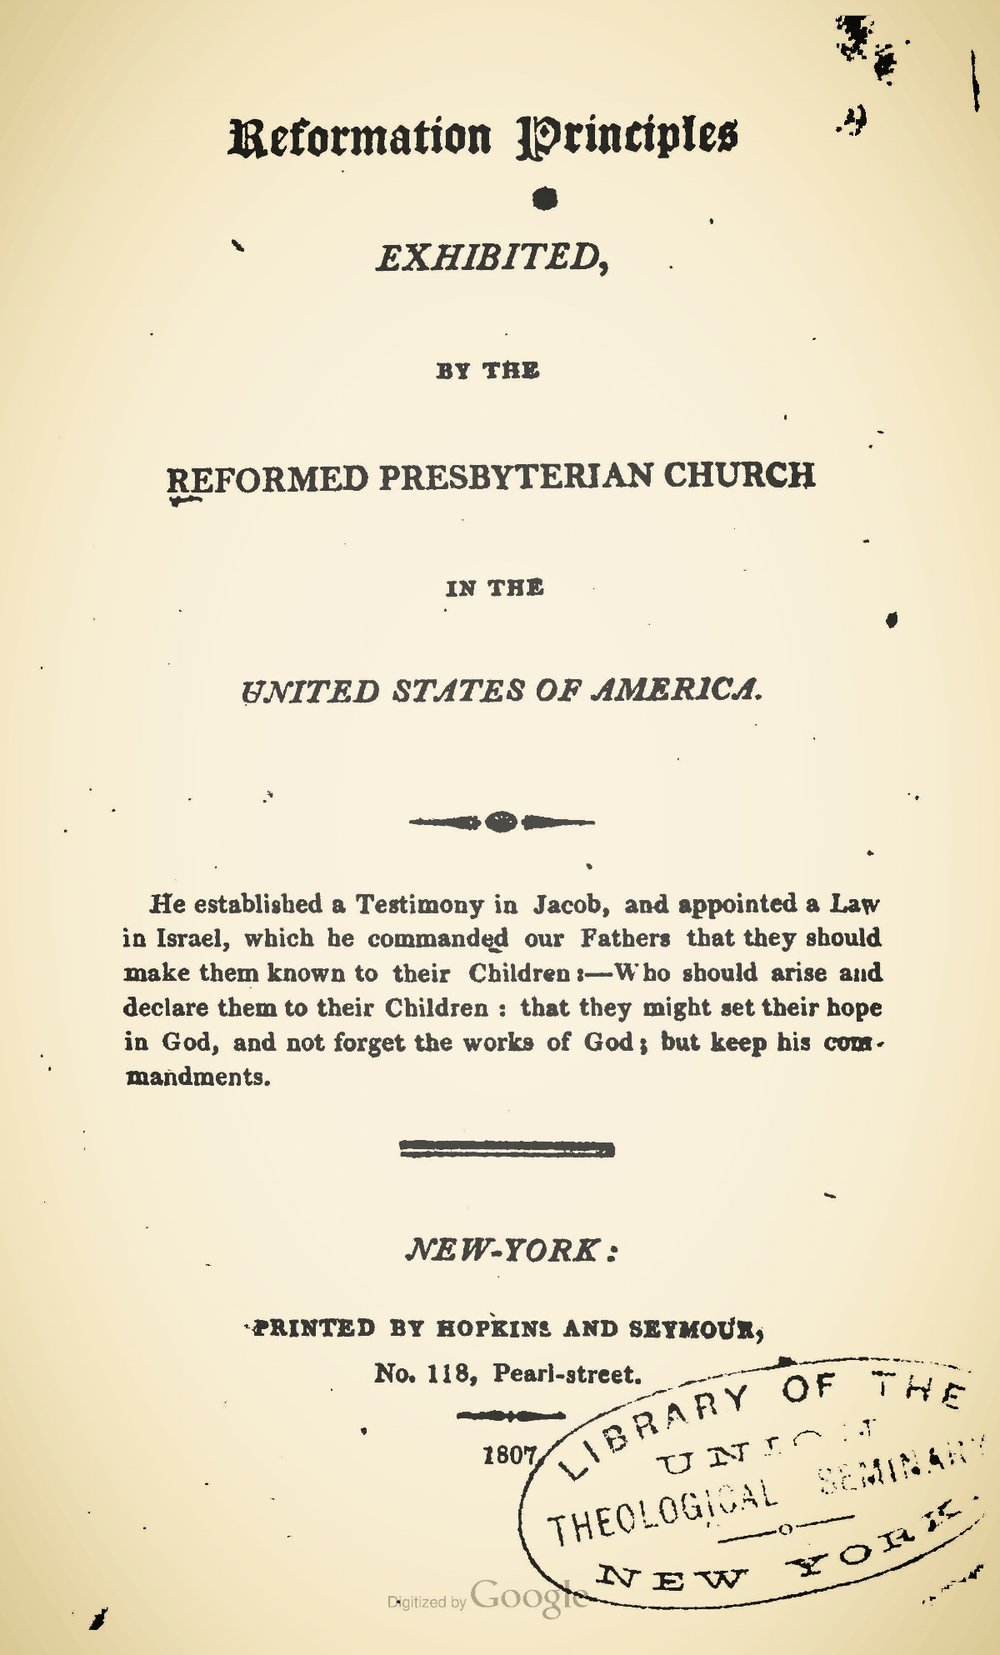 McLeod, Alexander, Reformation Principles Exhibited Title Page.jpg